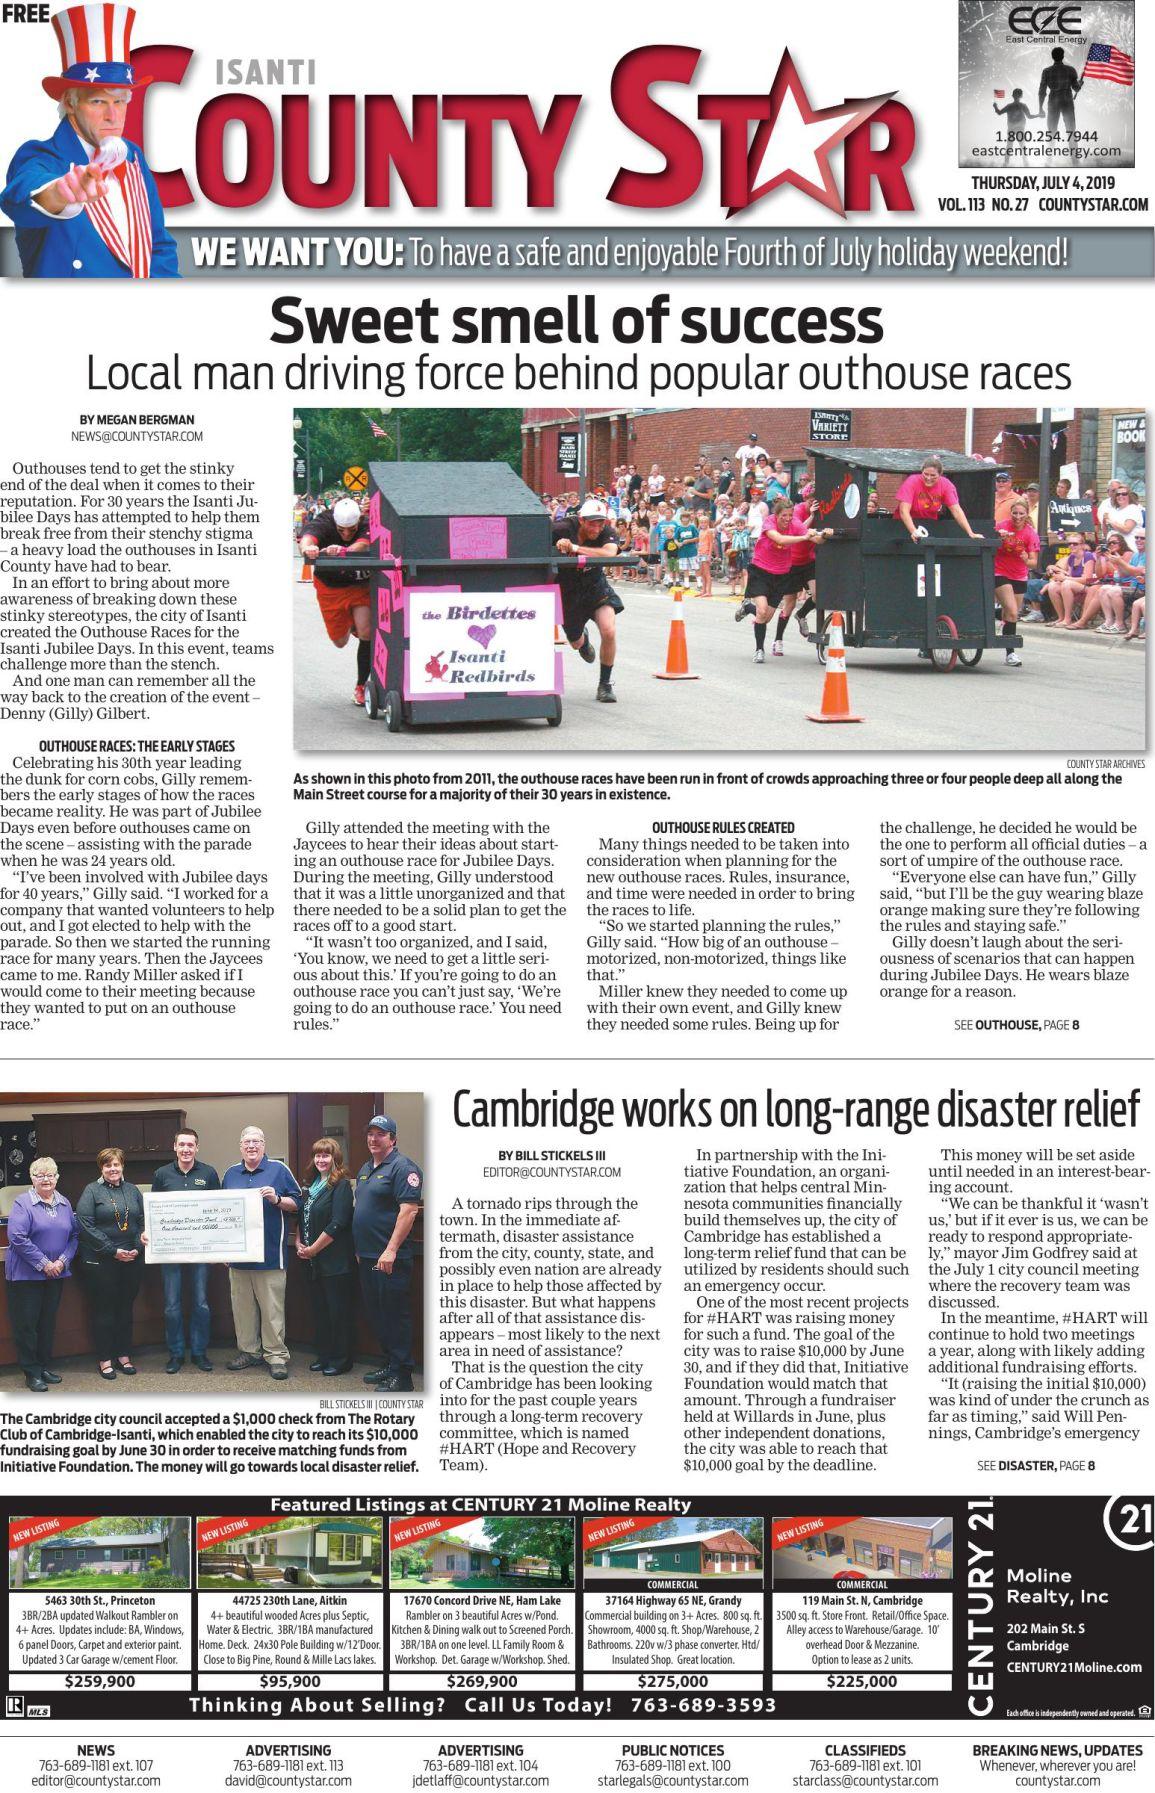 Isanti County Star e-edition July 4, 2019